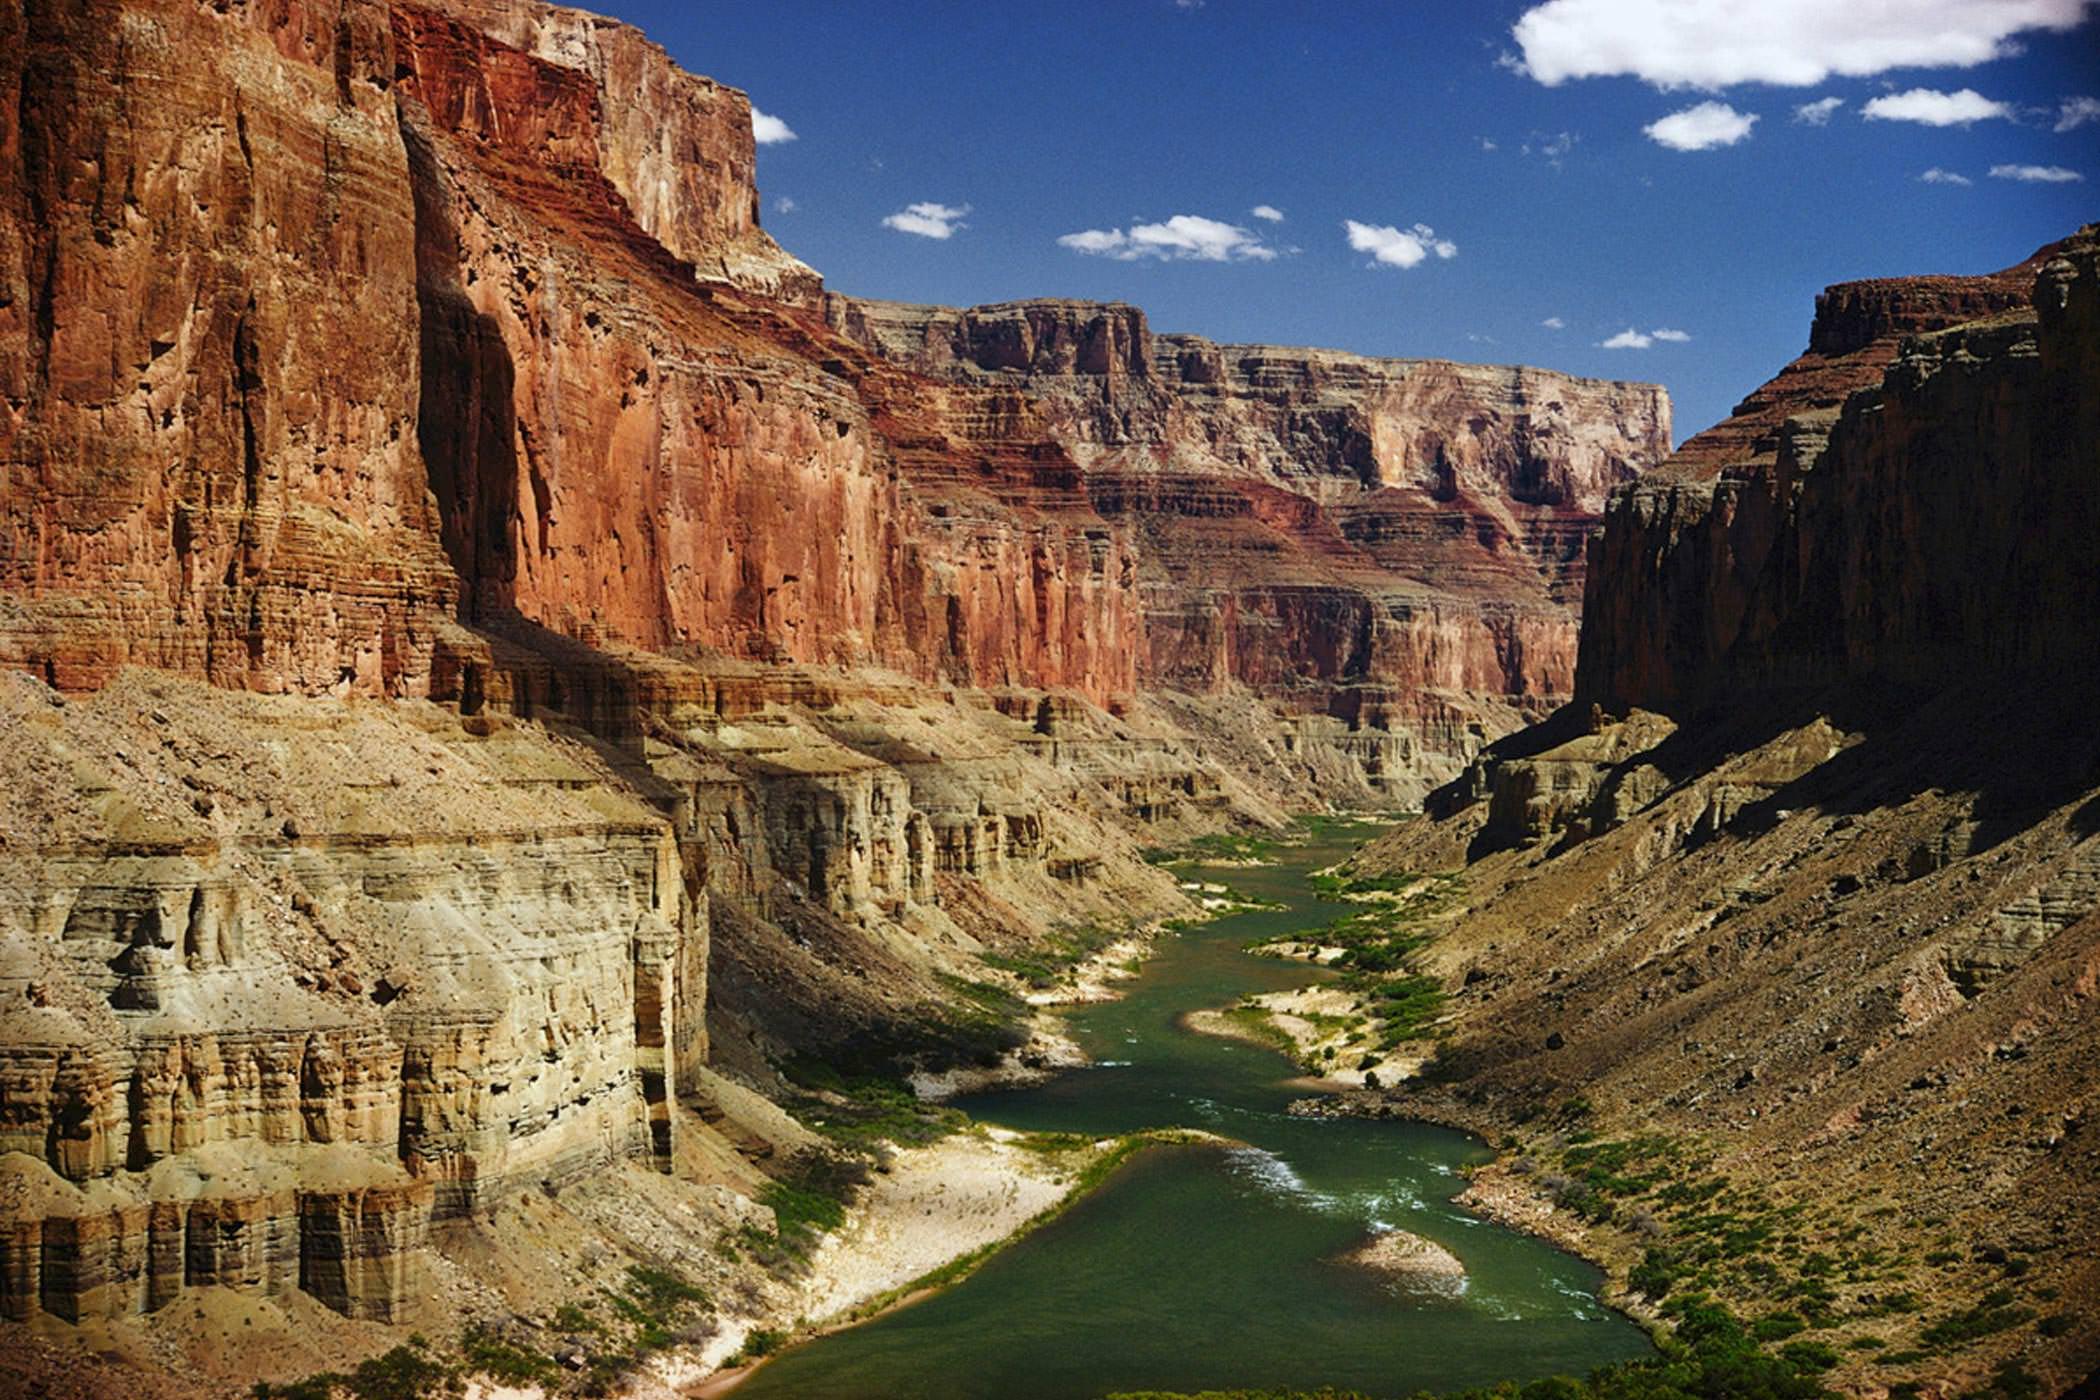 Ernst Haas Photographie, Grand Canyon, Arizona, USA, 1963